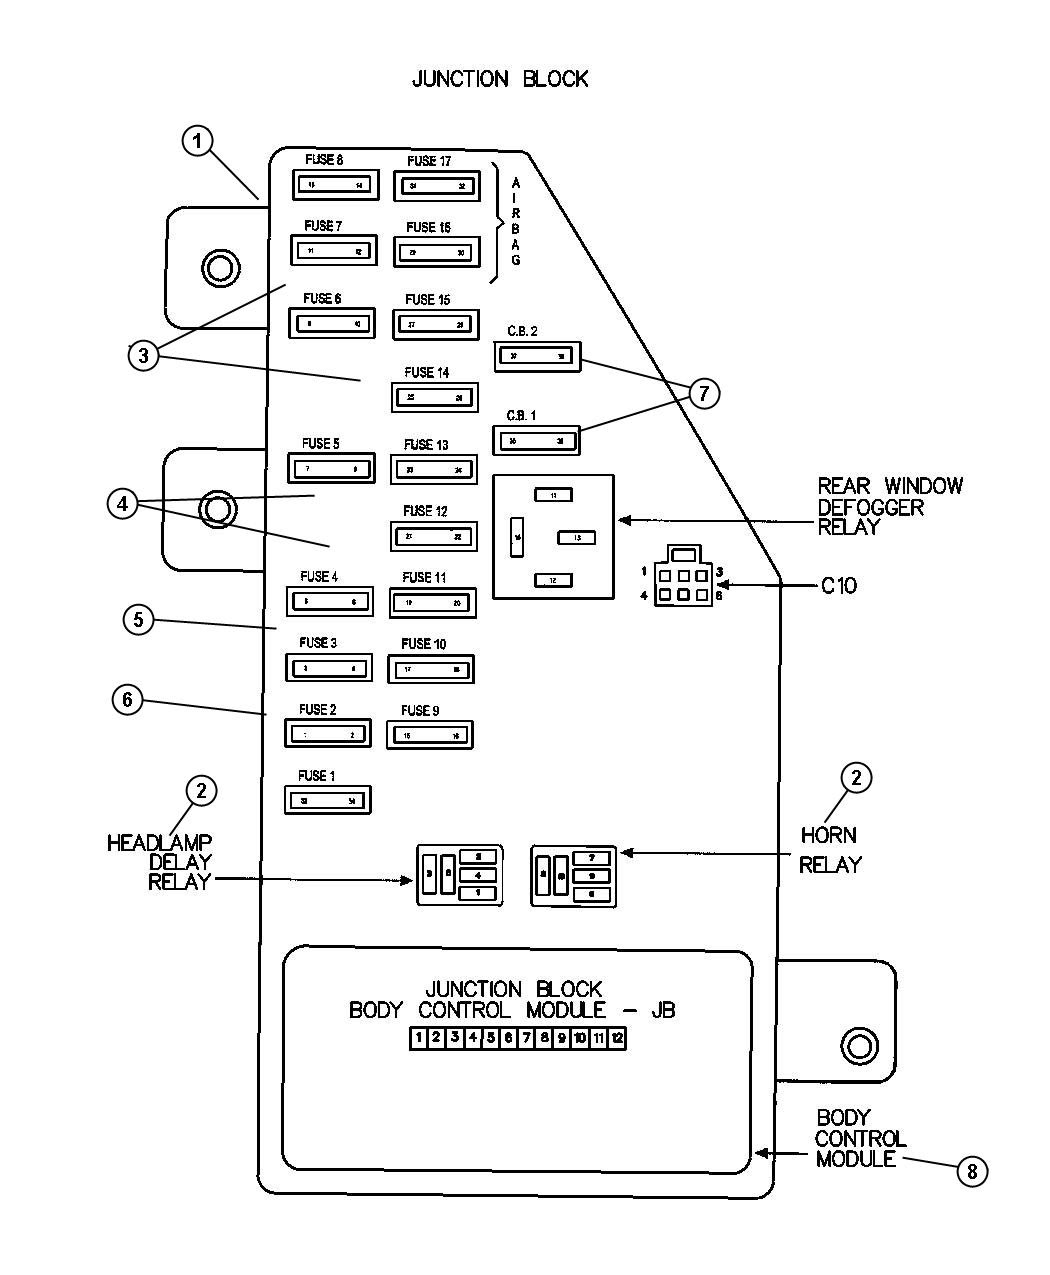 Fuse Box Diagram For 2005 Dodge Stratus Wiring Diagram Shorts Pair A Shorts Pair A Zaafran It